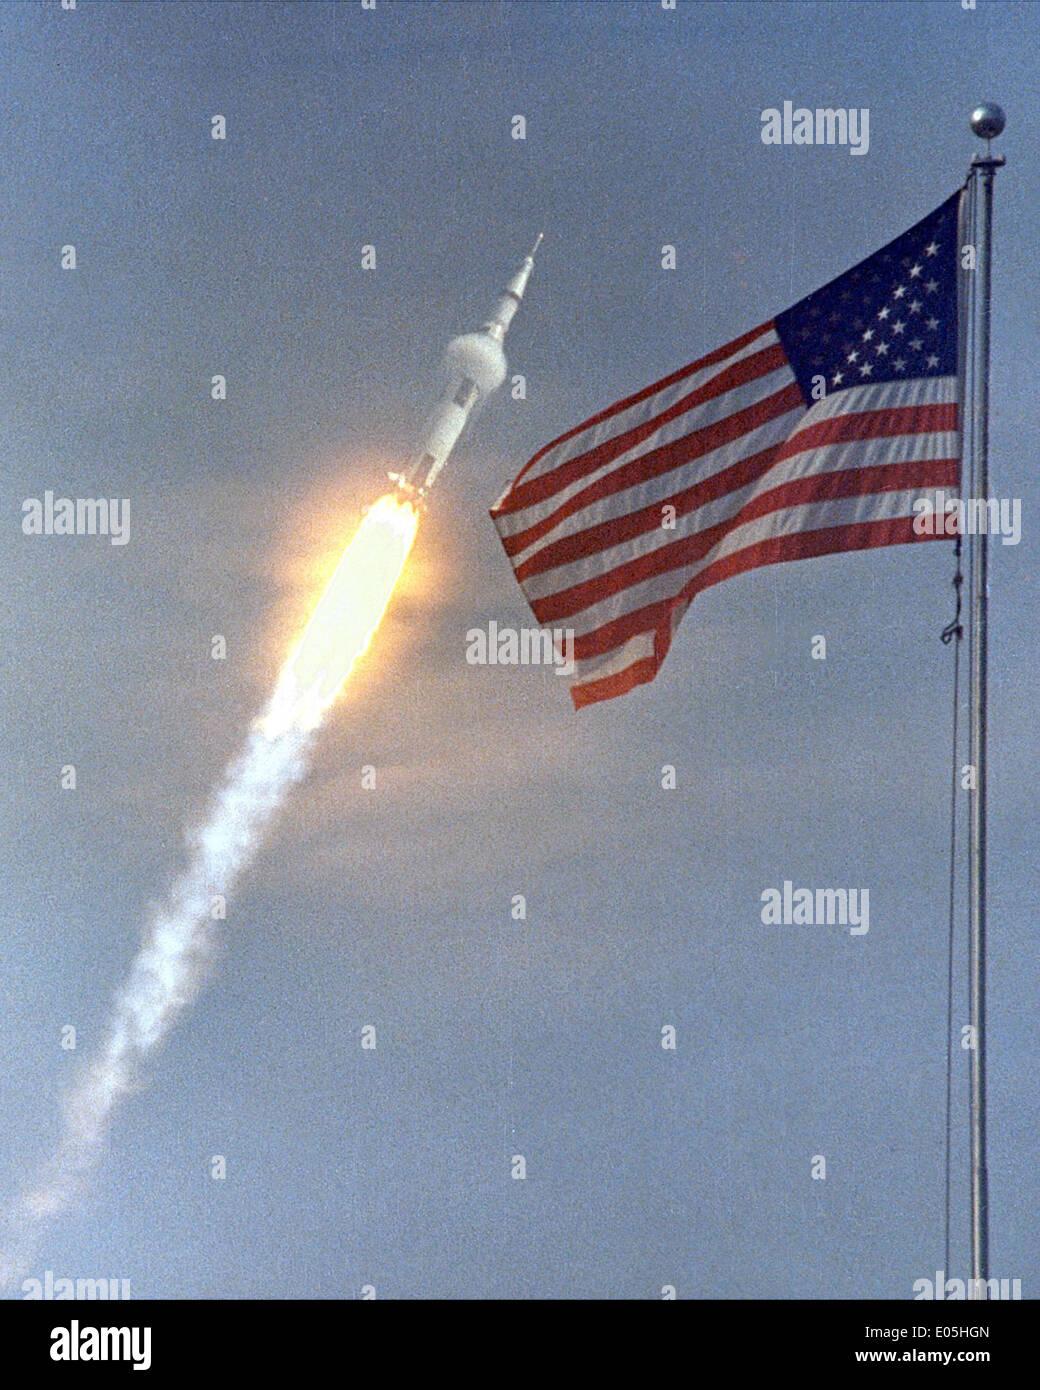 apollo 11 space mission mike - photo #31